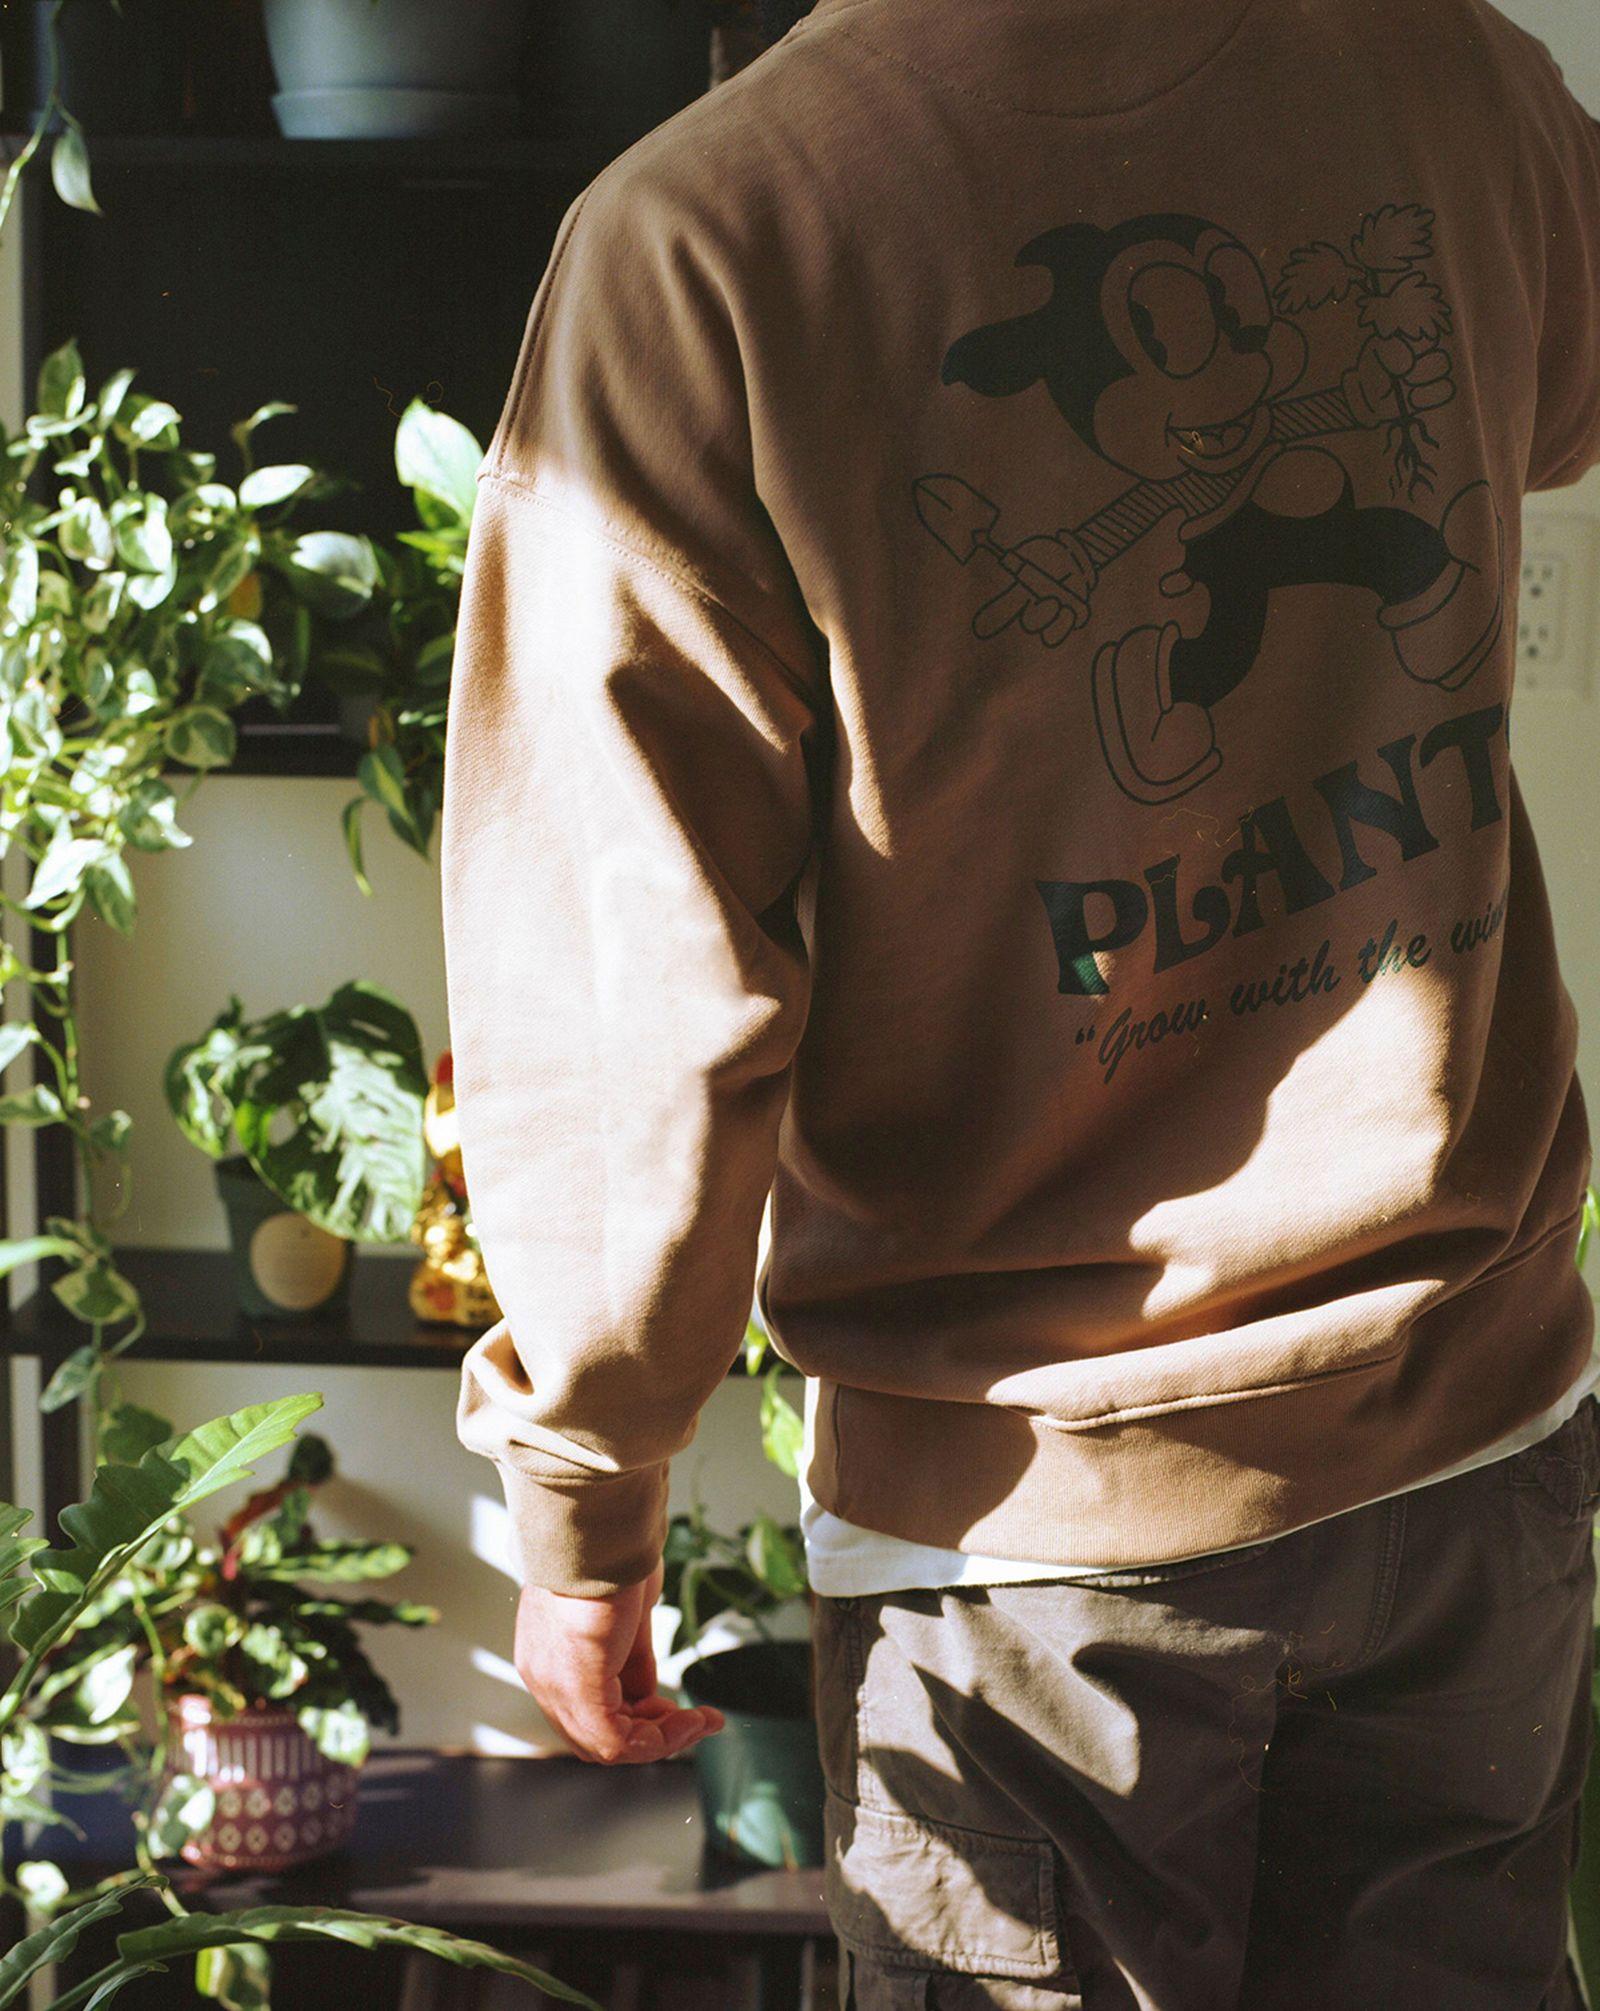 plant-man-p-hm-blank-staples-new-013